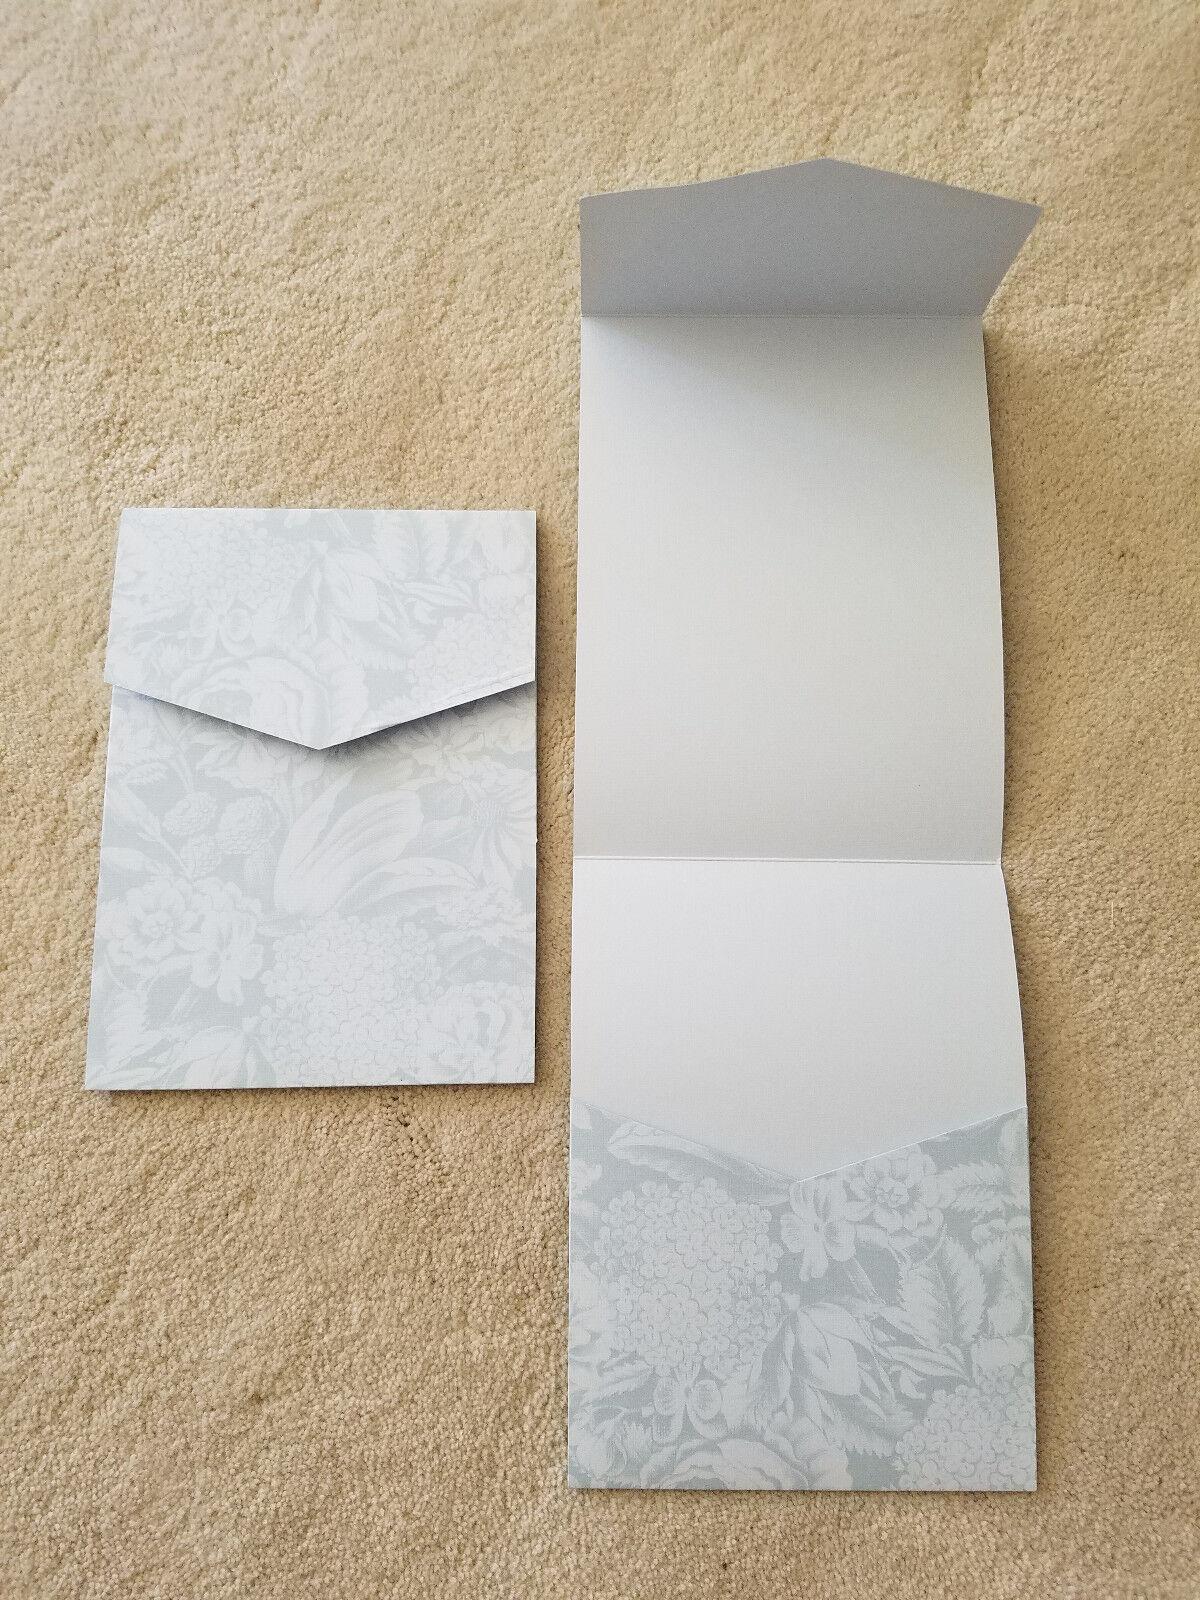 Poche Fold invitations par envelopments fleuri bleu 5 1 4  X 7 1 4  Quantité 105